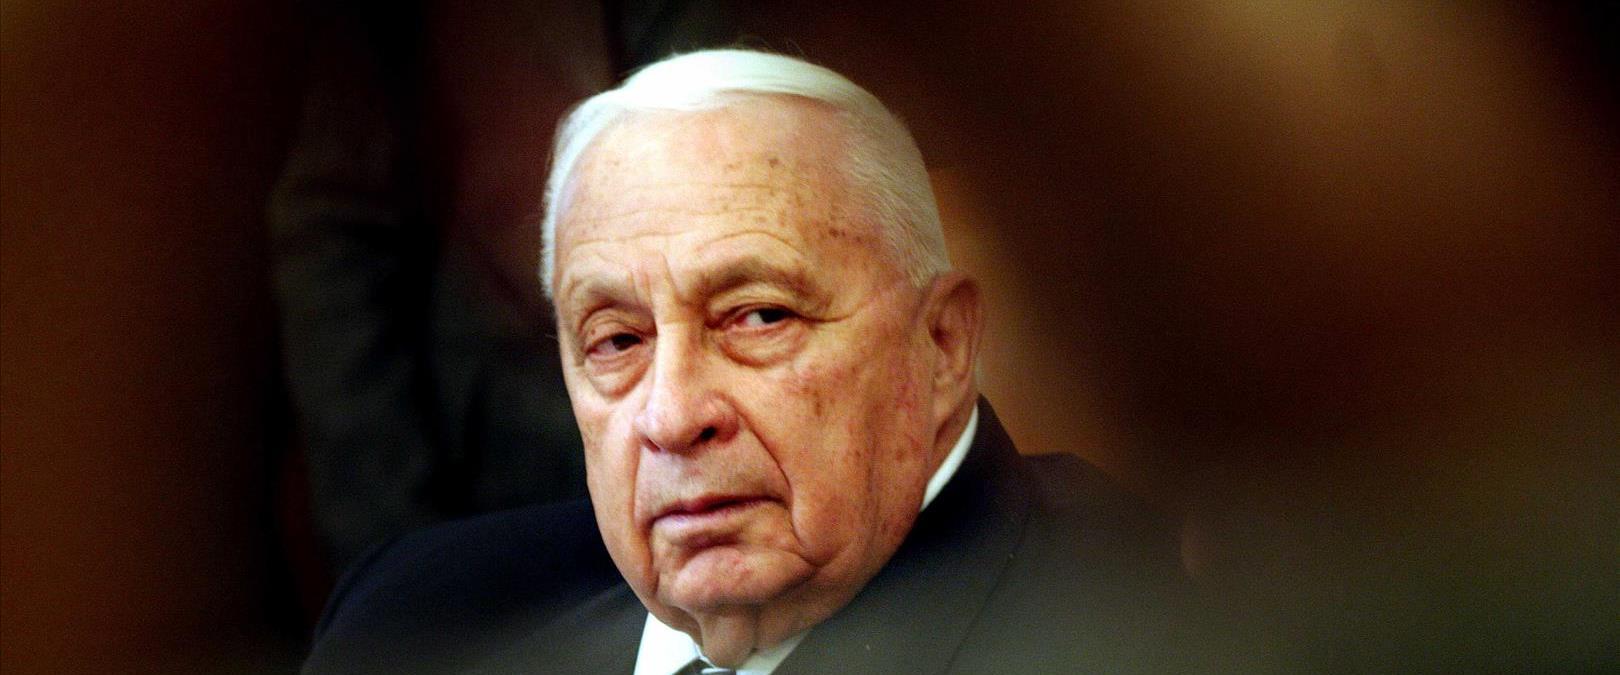 אריאל שרון, ארכיון